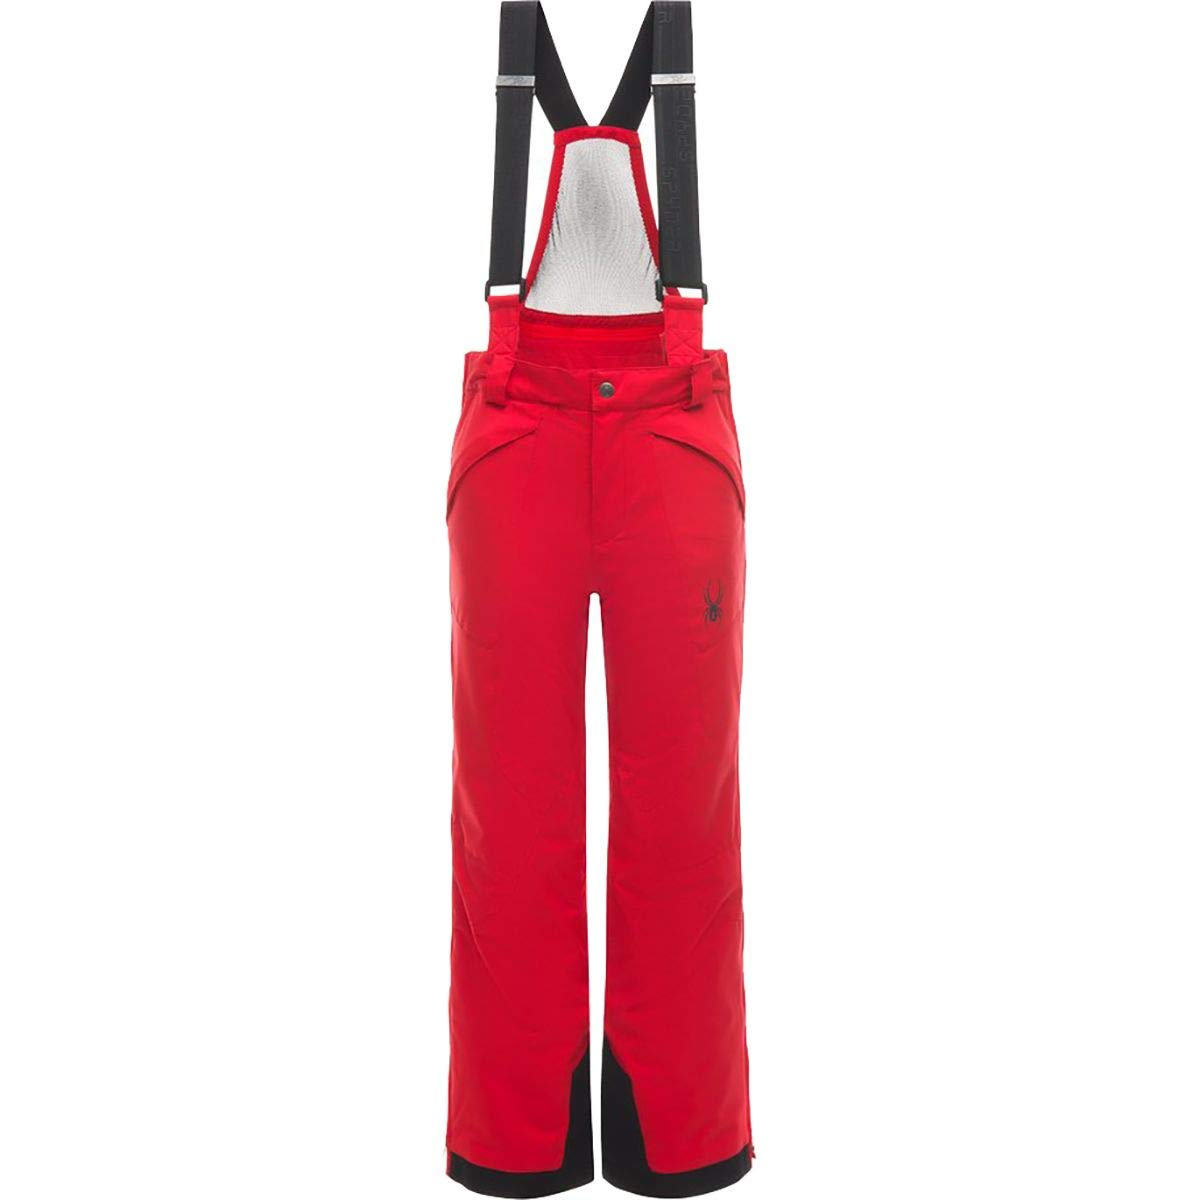 Spyder Kids Boy's Guard Pants (Big Kids) Red/Black 8